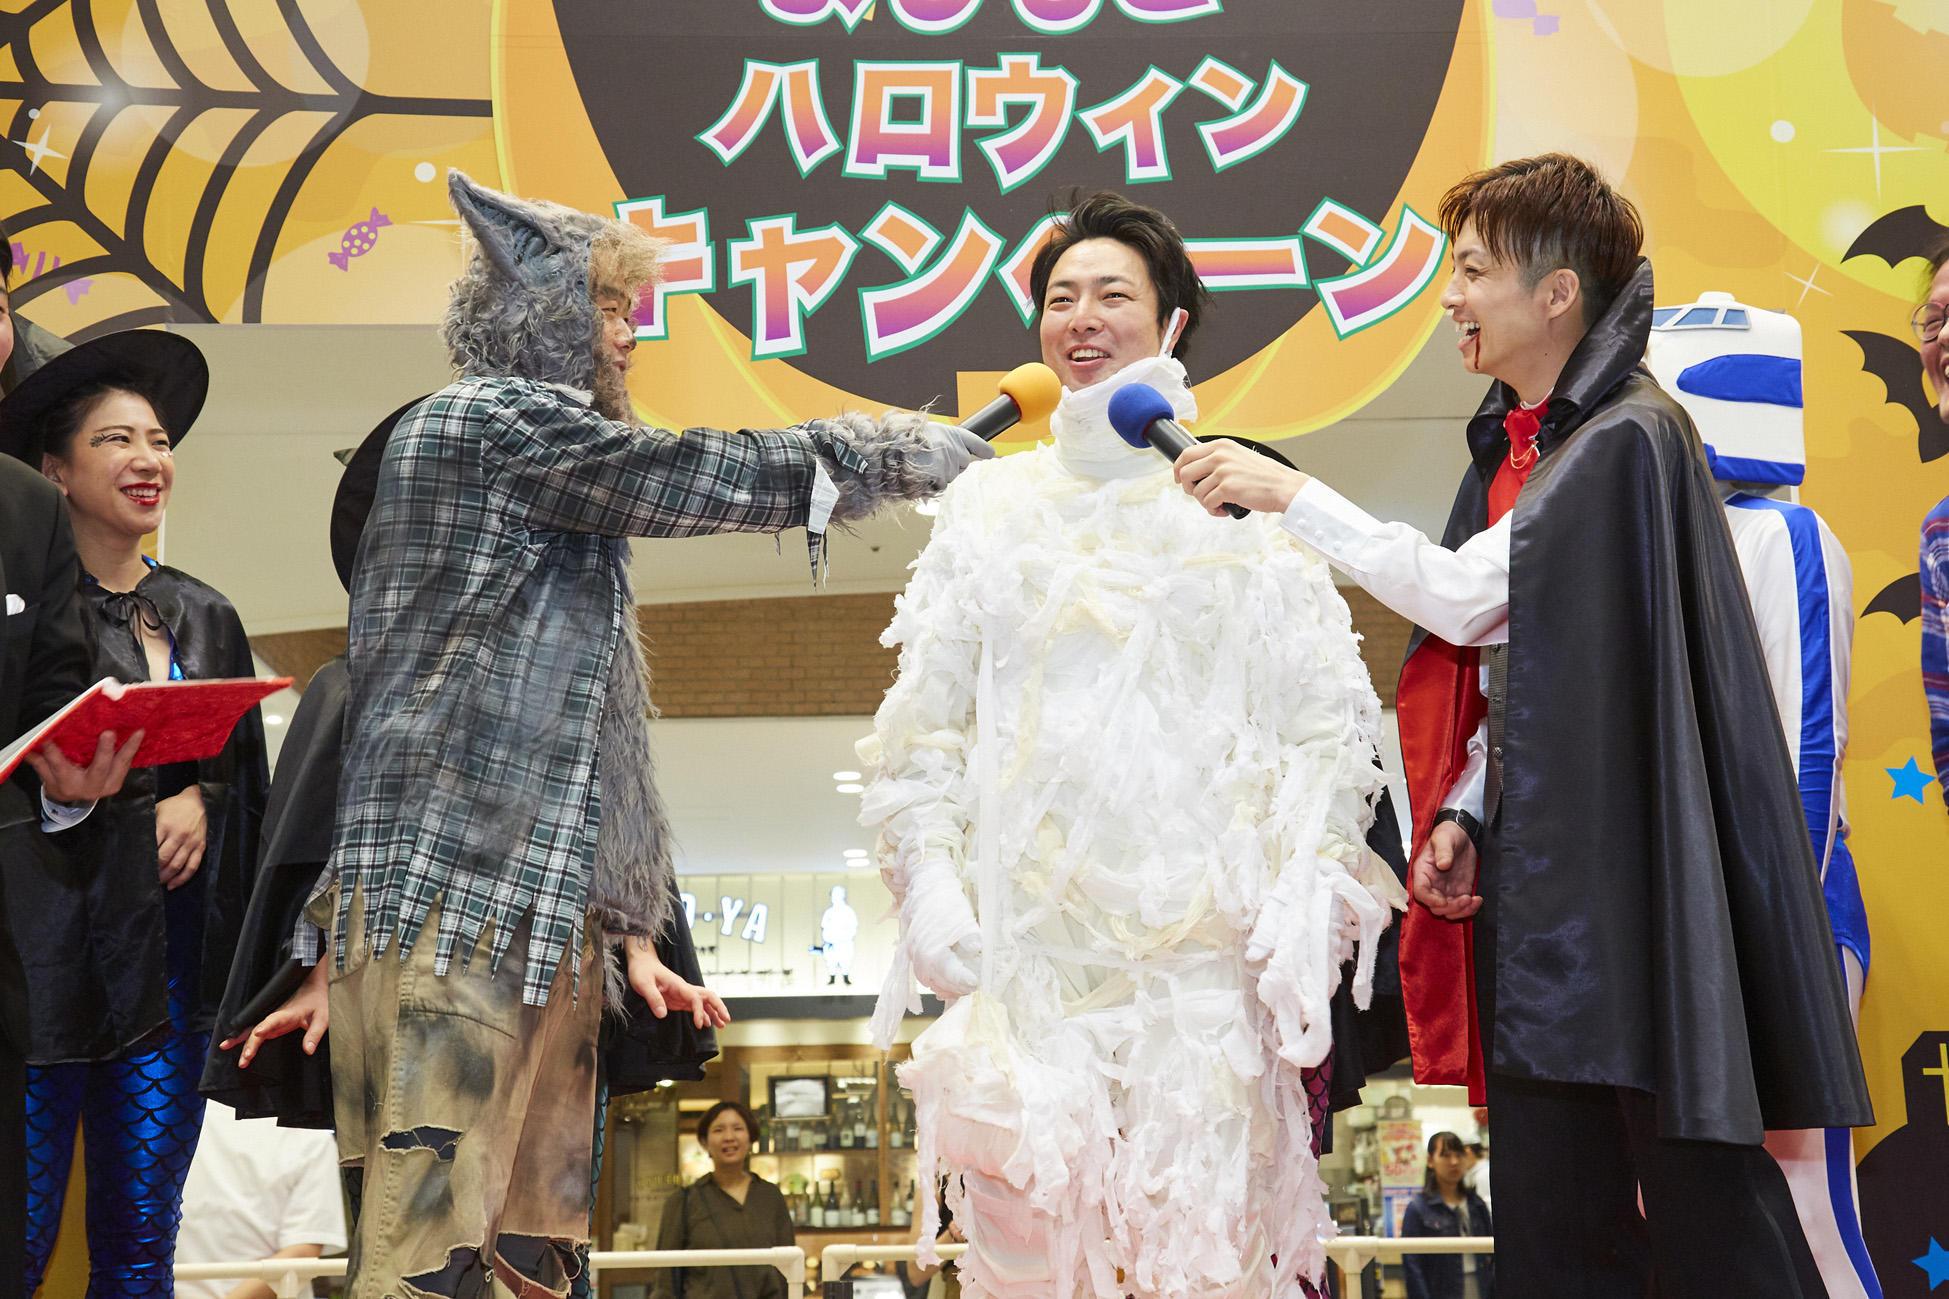 http://news.yoshimoto.co.jp/20180921221553-28970a0810338e8ae805d50b30ff588471e1e172.jpg